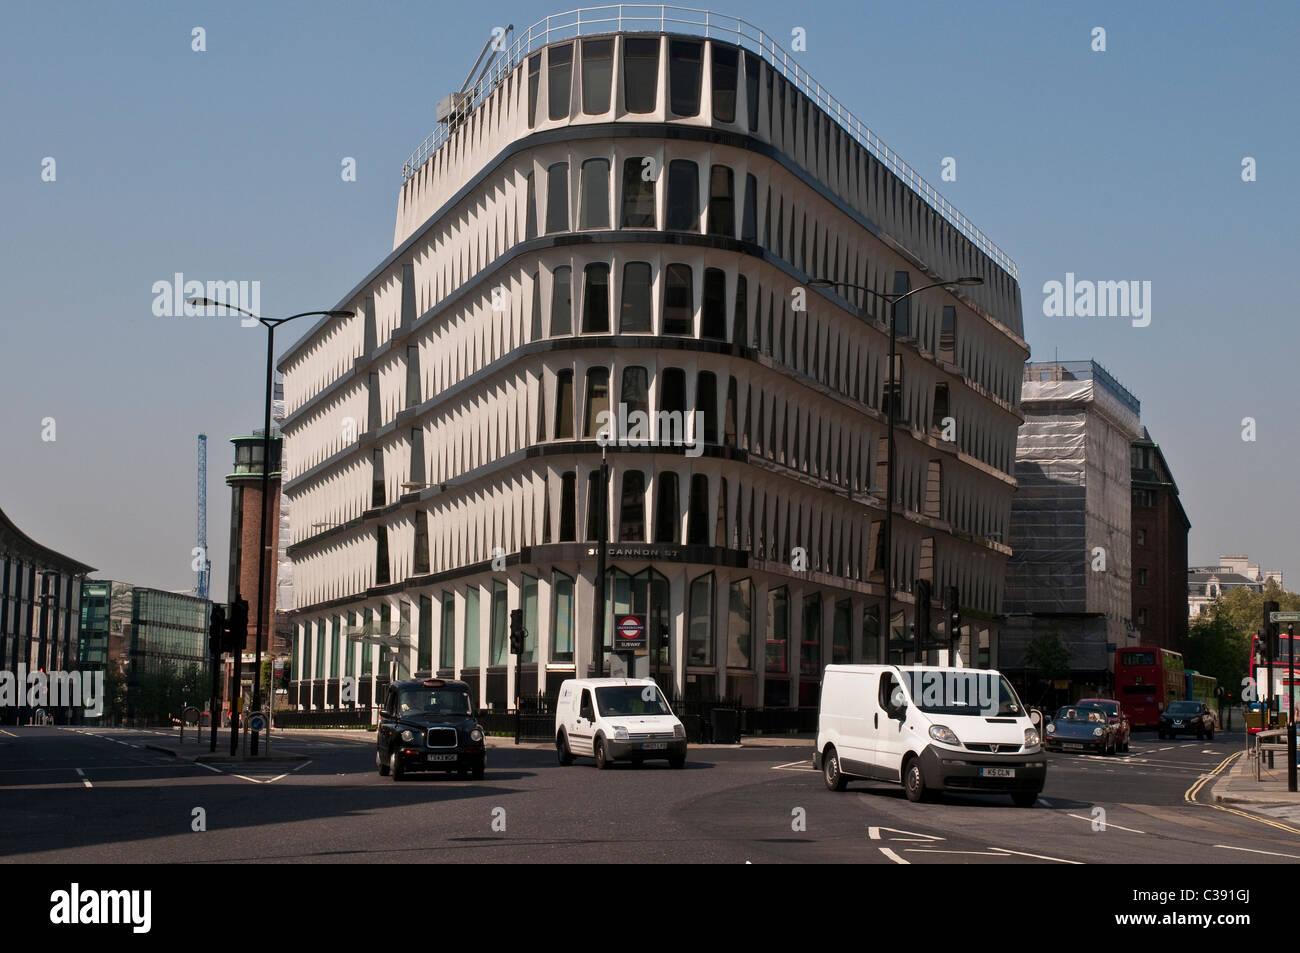 30 Cannon Street building, City of London, UK - Stock Image